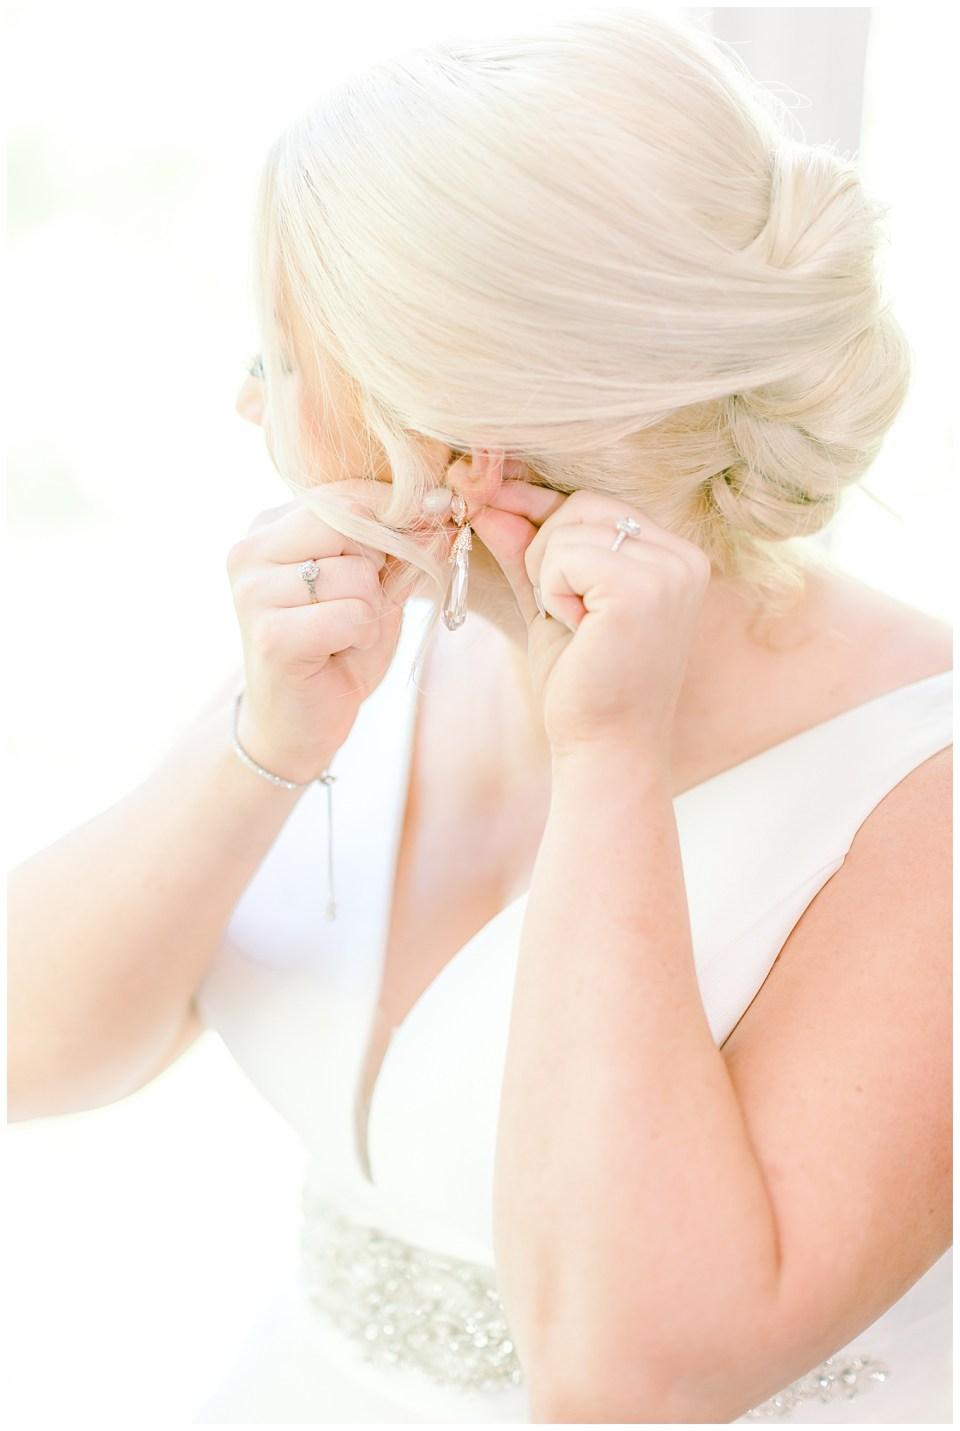 bridal hair and earrings details